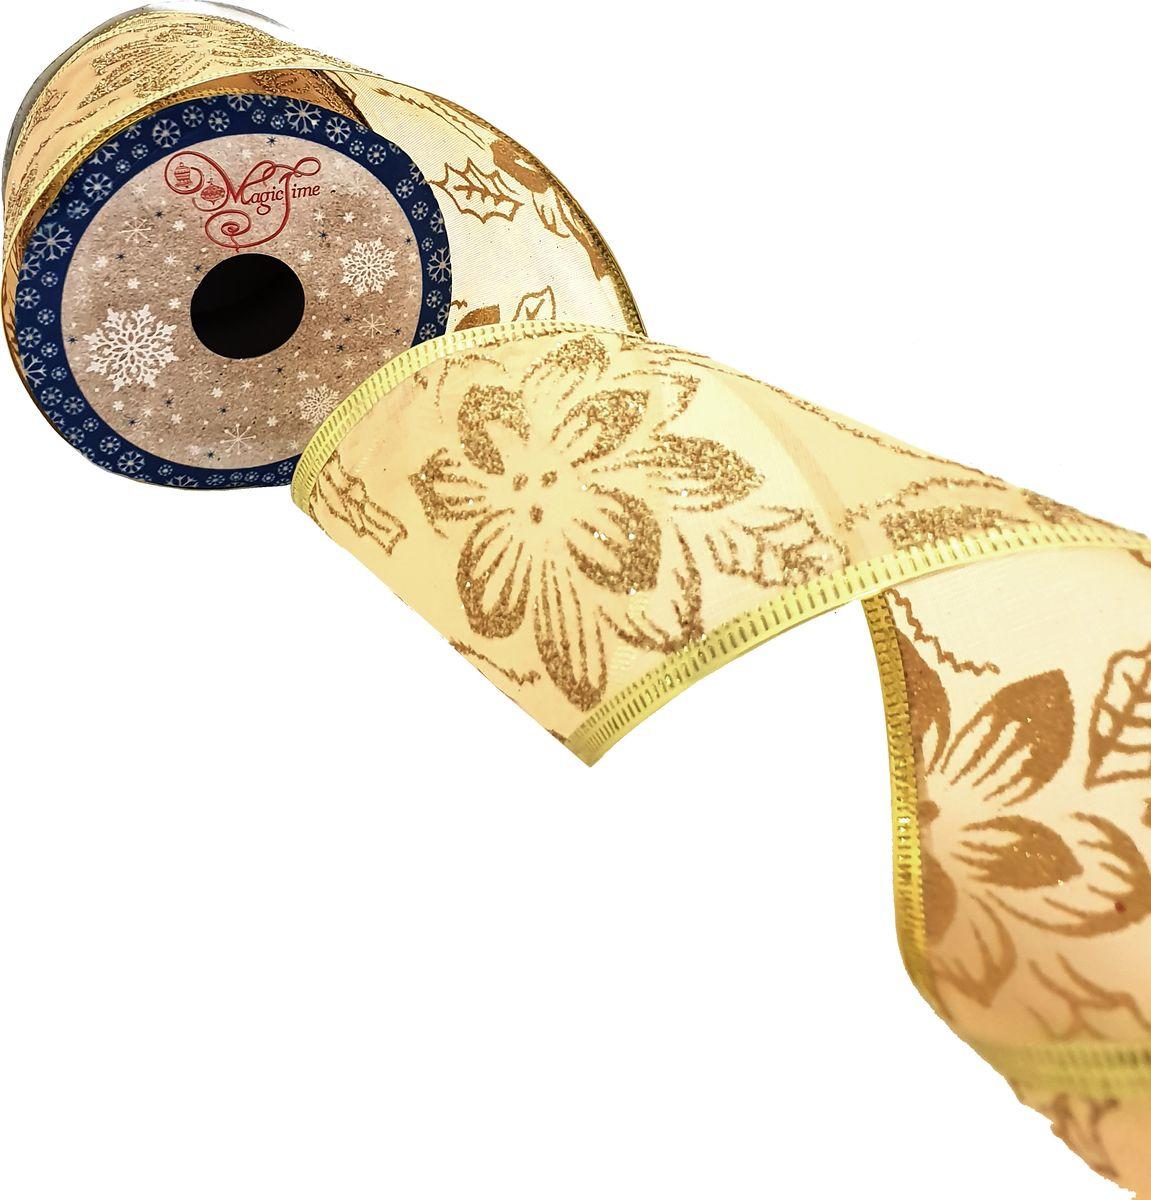 Лента новогодняя Magic Time Золотой рисунок, 270 х 6,3 см. 78652 новогодняя лента magic time золотое конфетти 78641